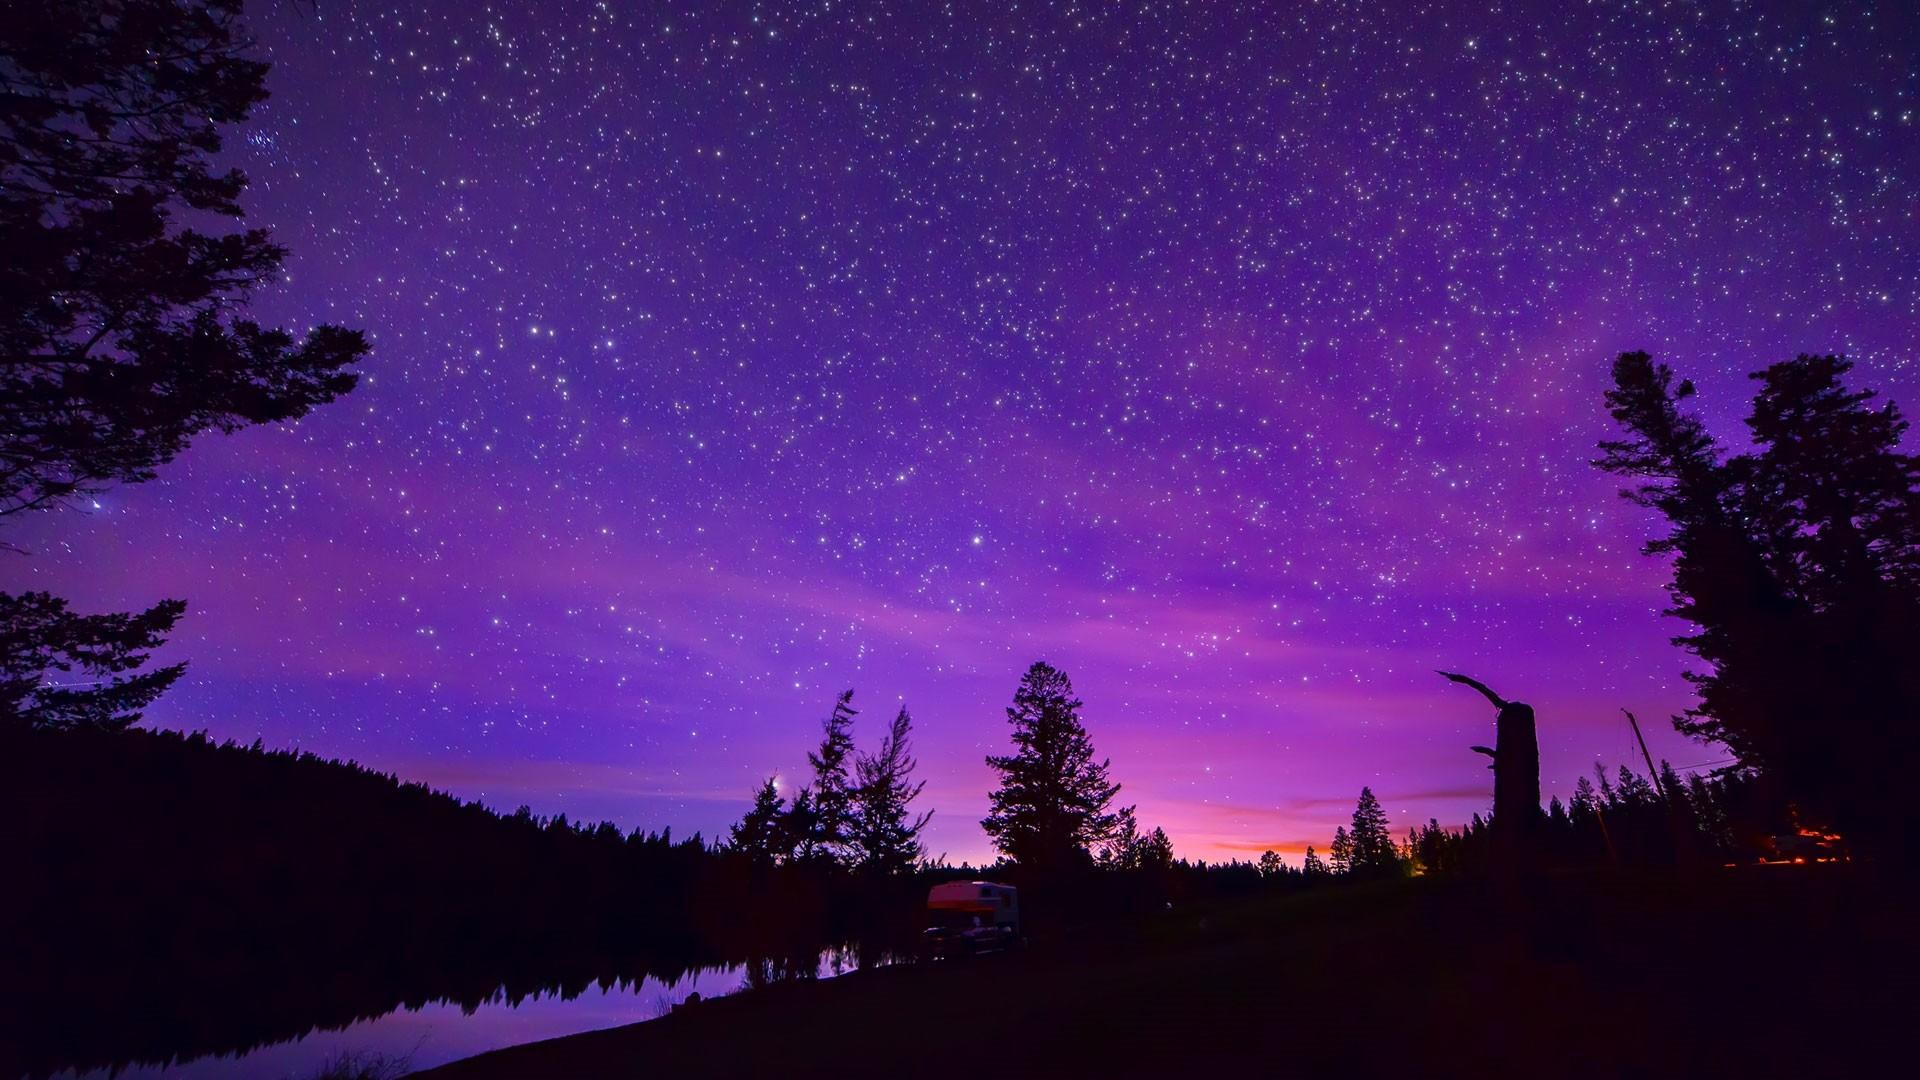 Purple Sky Image